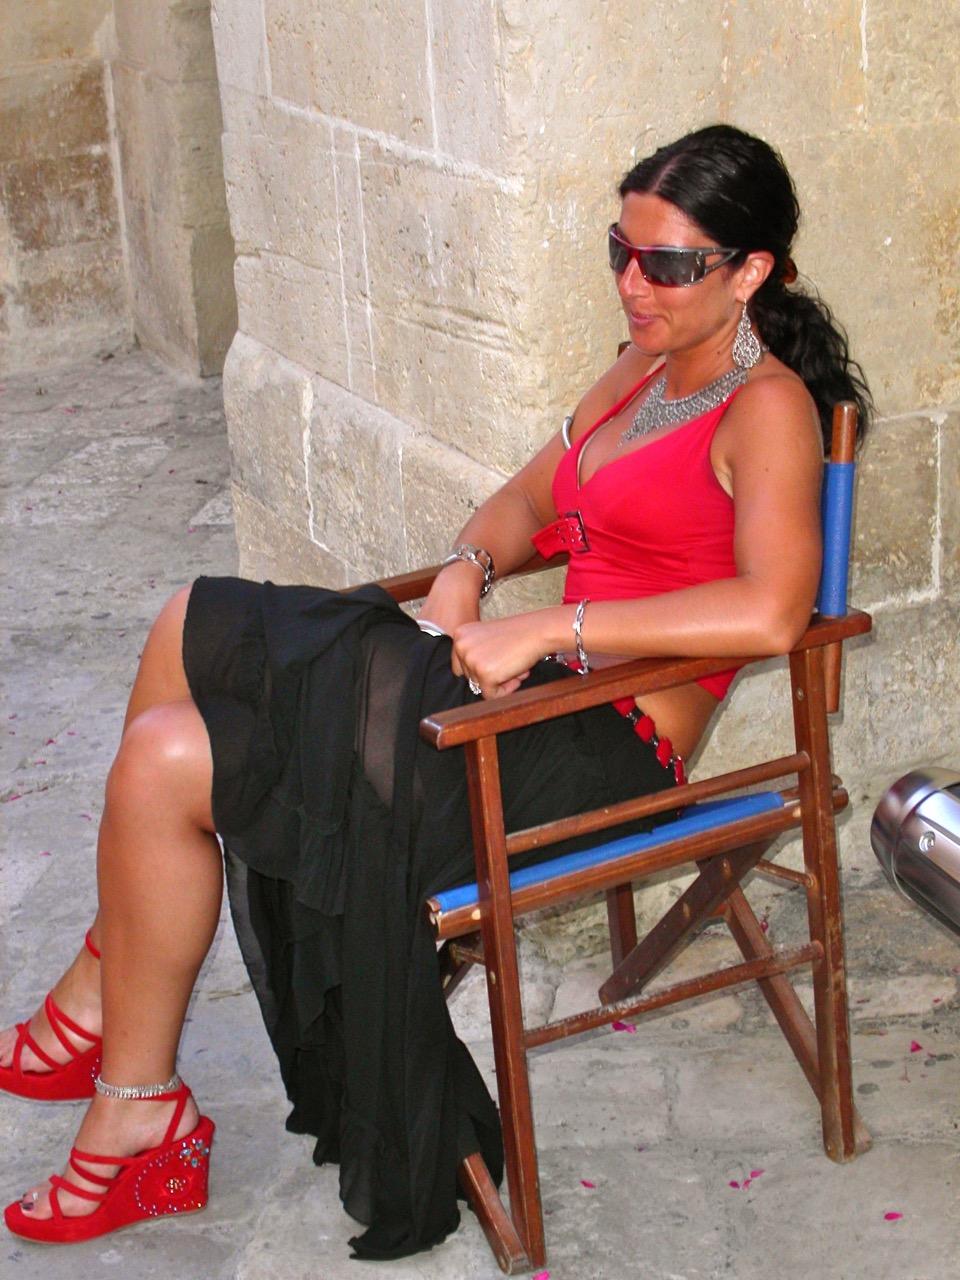 Red Shoes (Otranto, Italy)